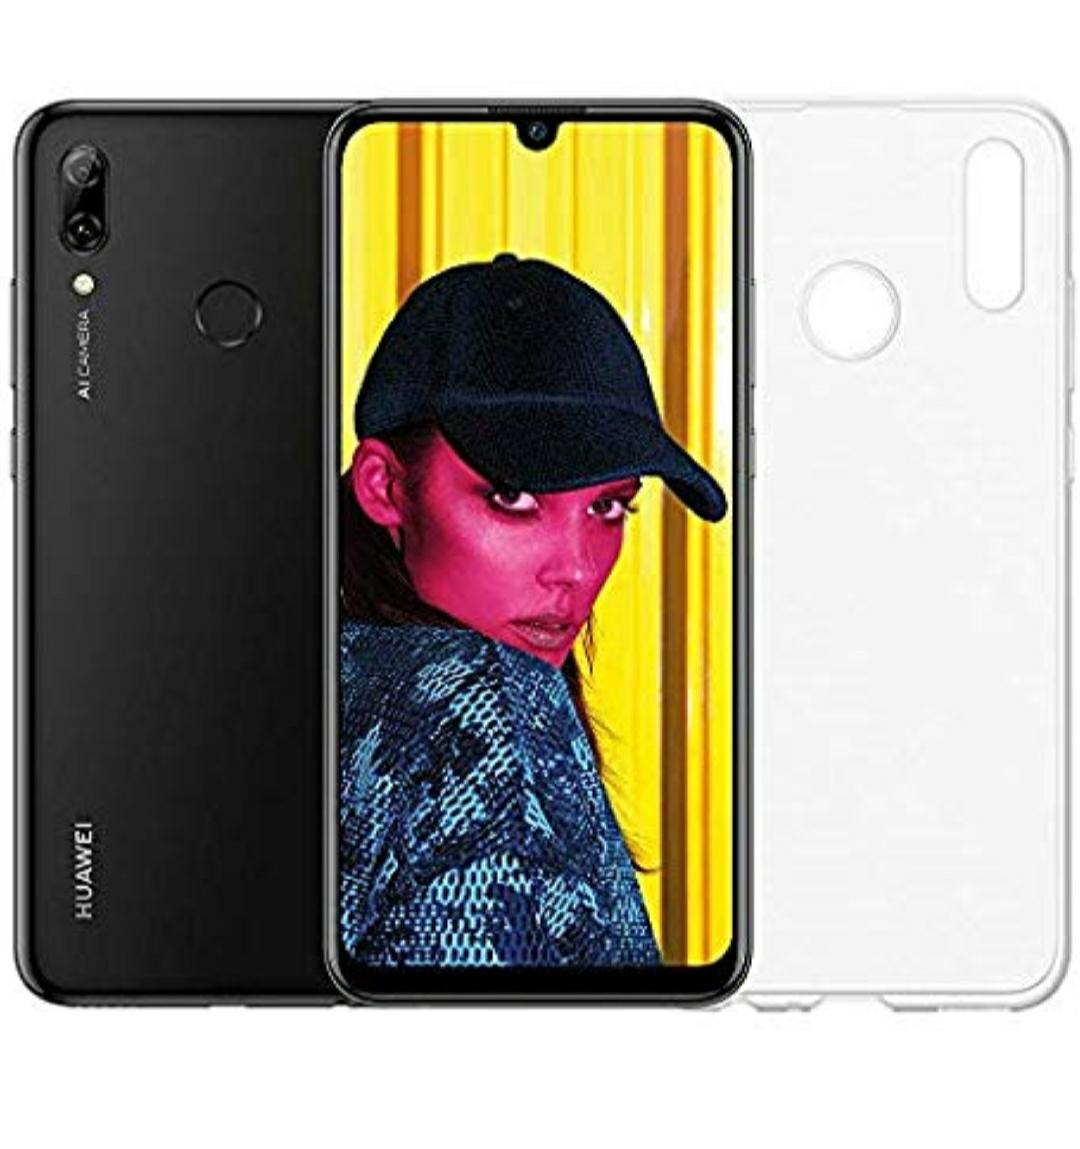 Huawei Psmart 2019 (Black) 64GB/3GB + Free transparent cover £154 Fee Free / £160 @ Amazon Italy